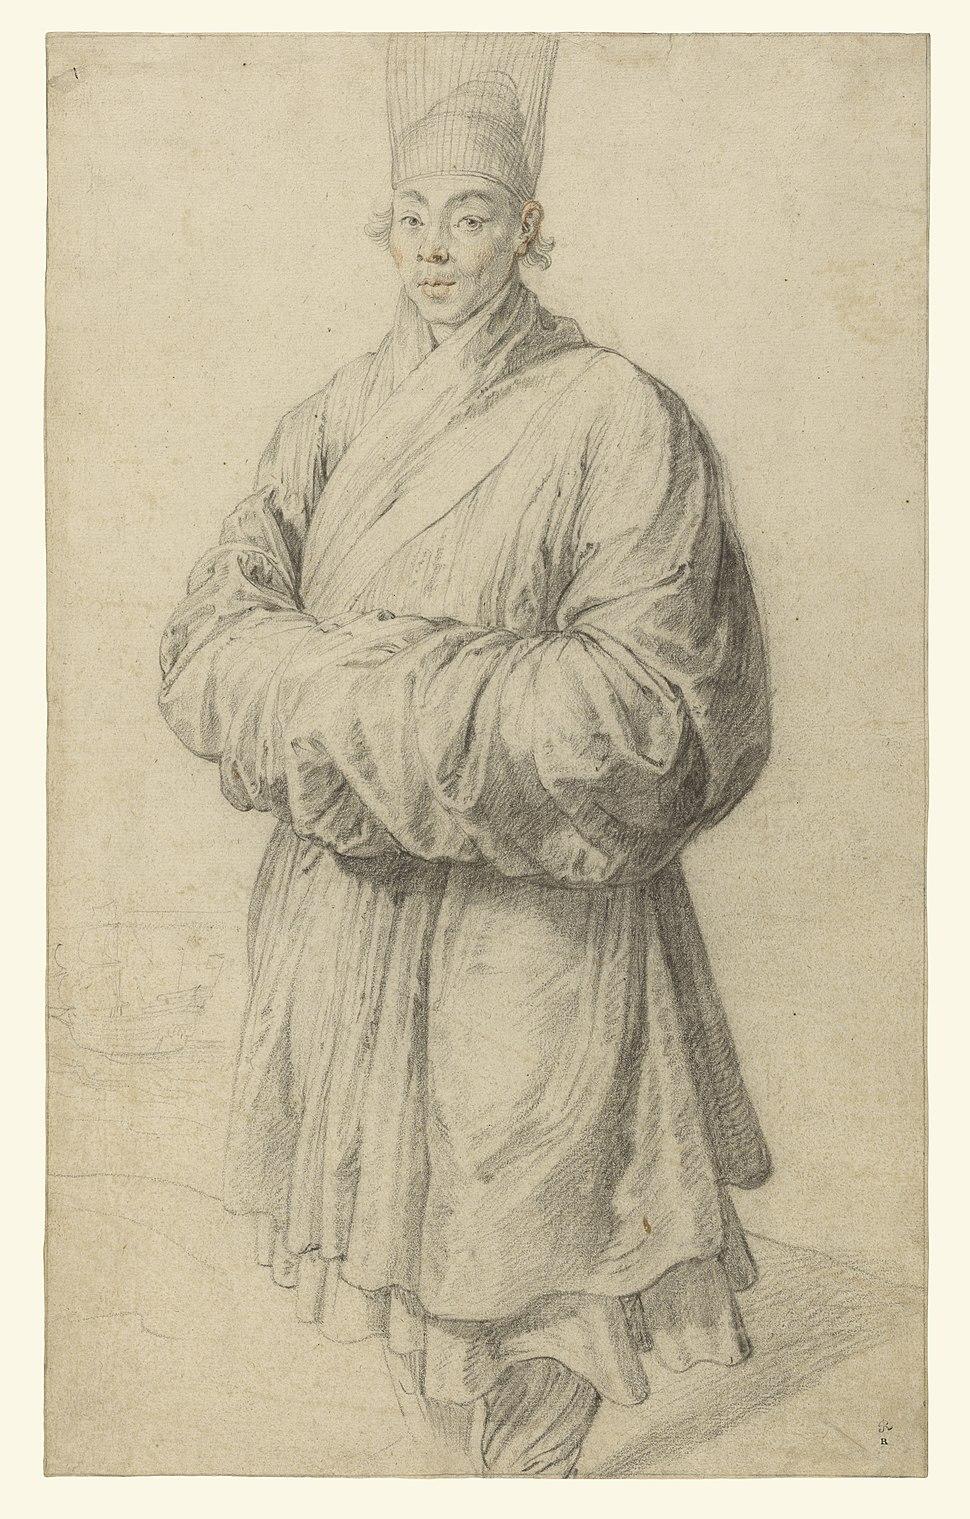 Peter Paul Rubens - Man in Korean Costume, about 1617